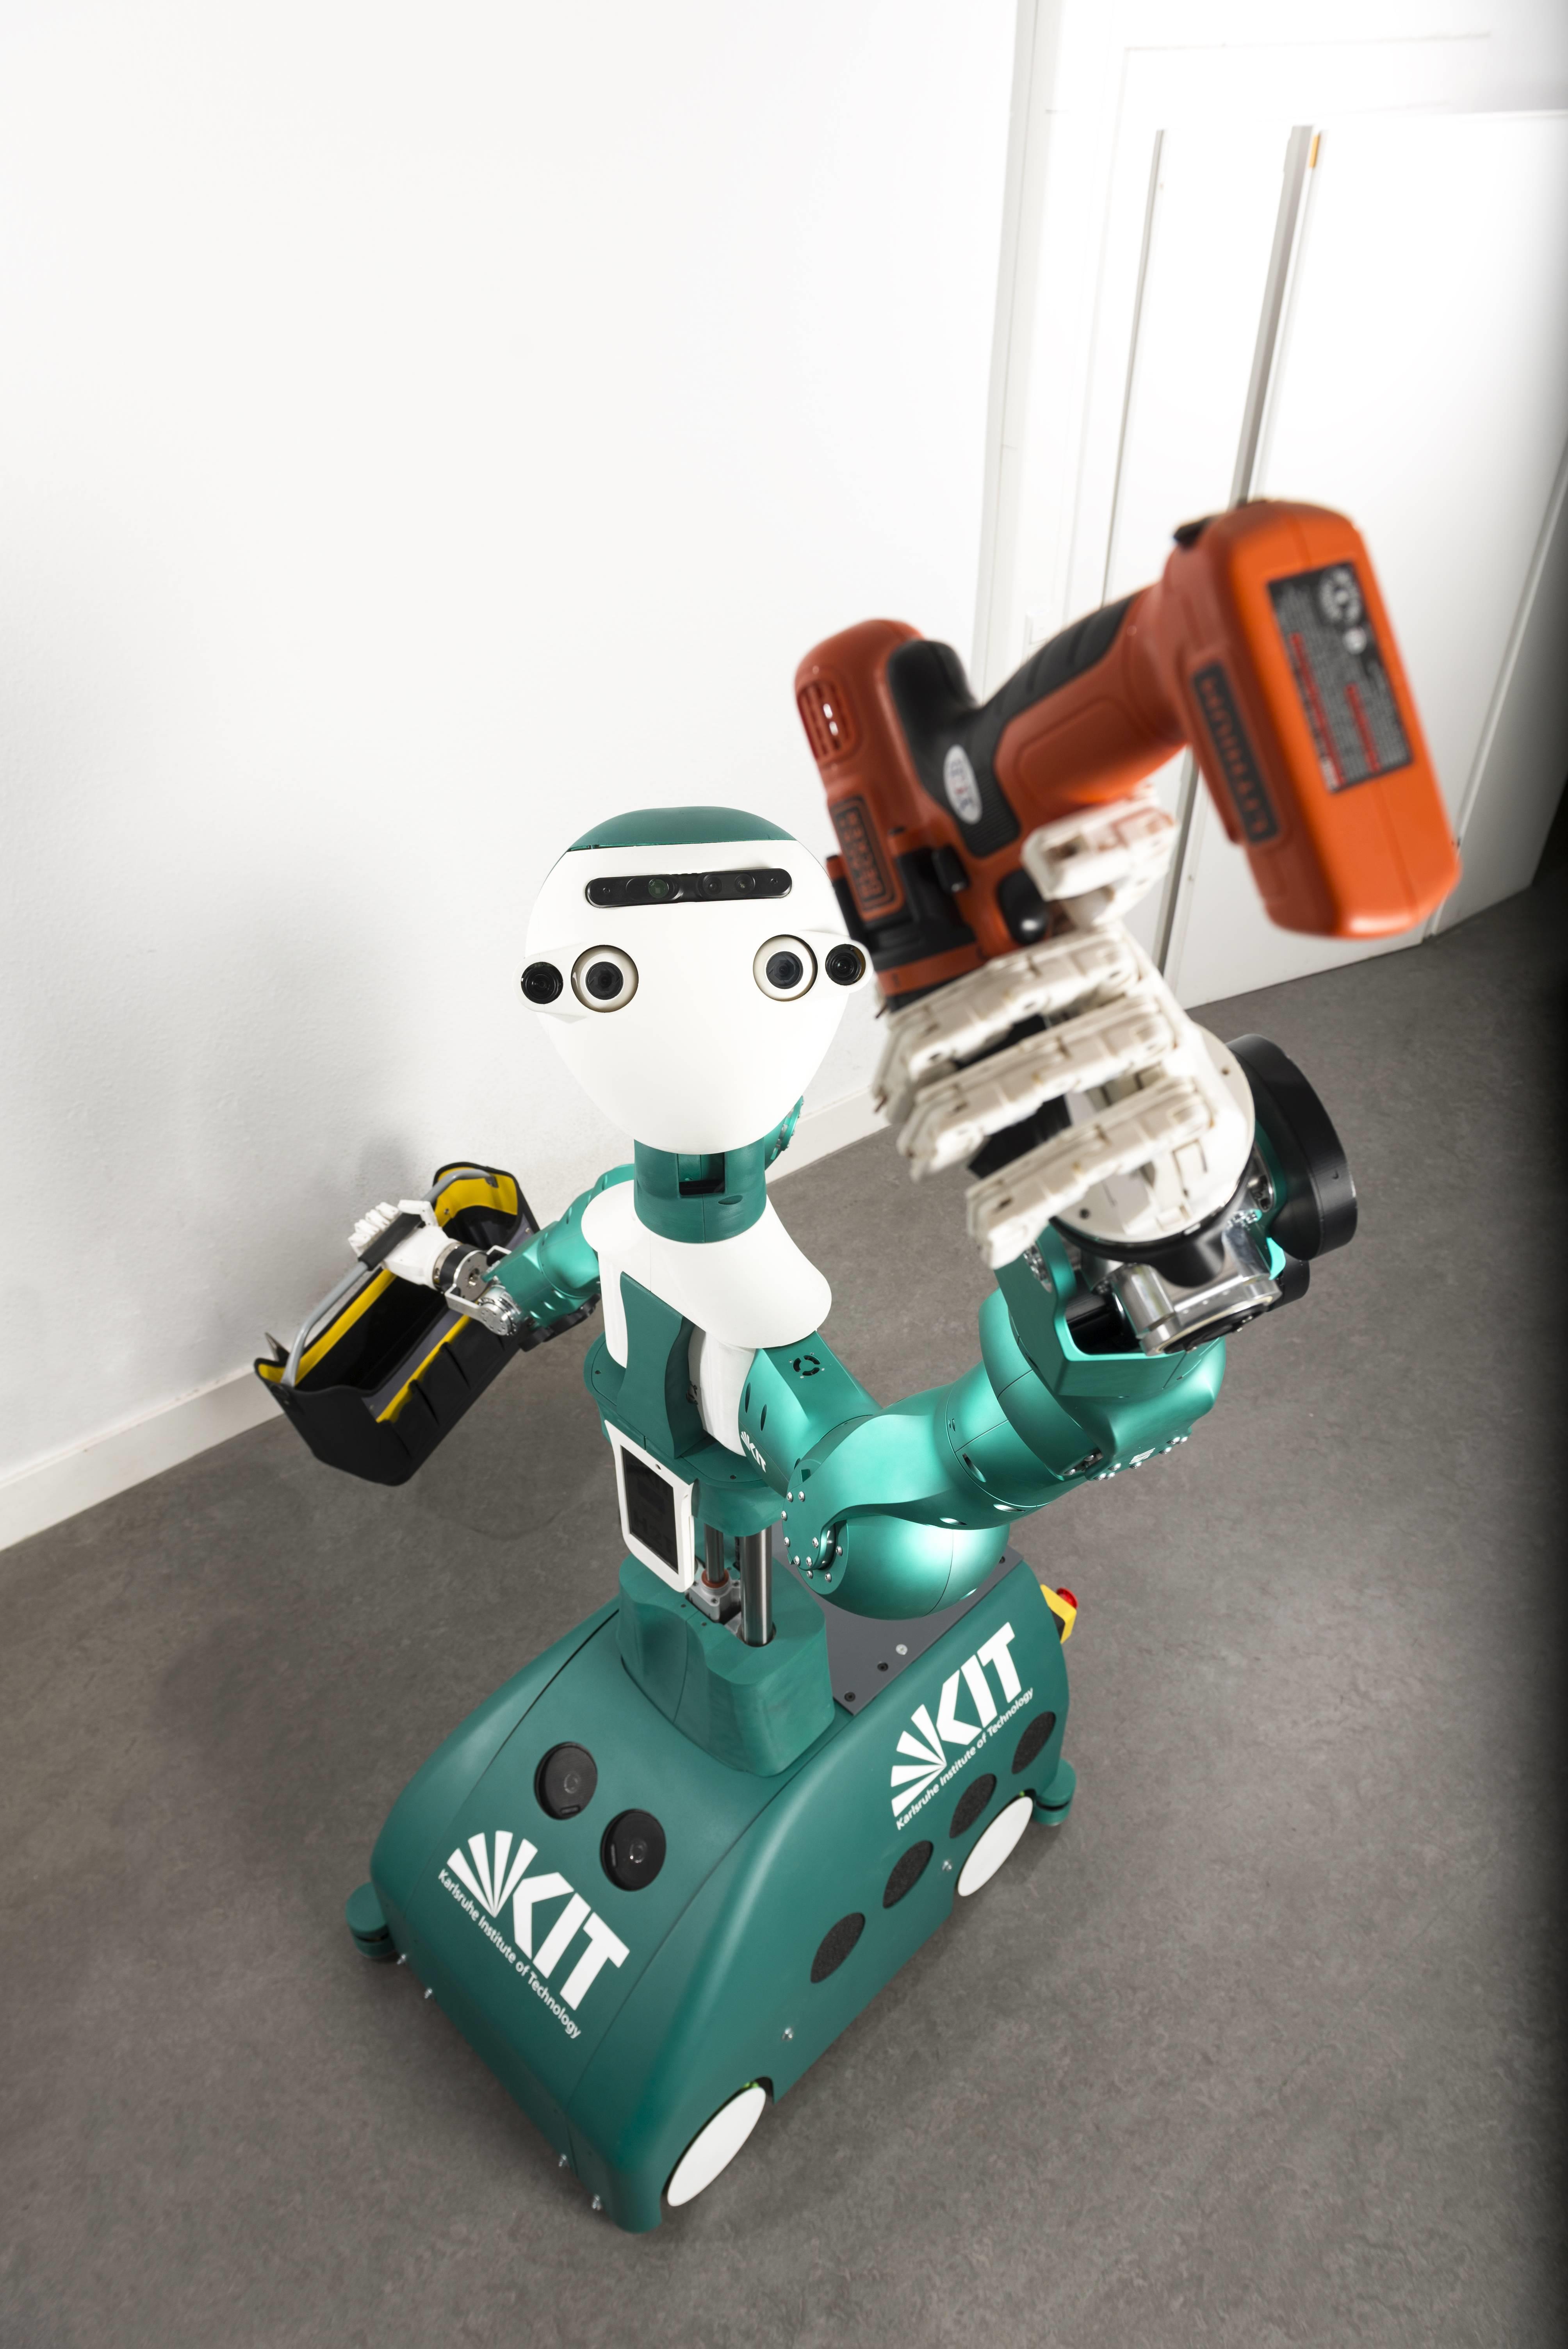 ARMAR-6 Cobot